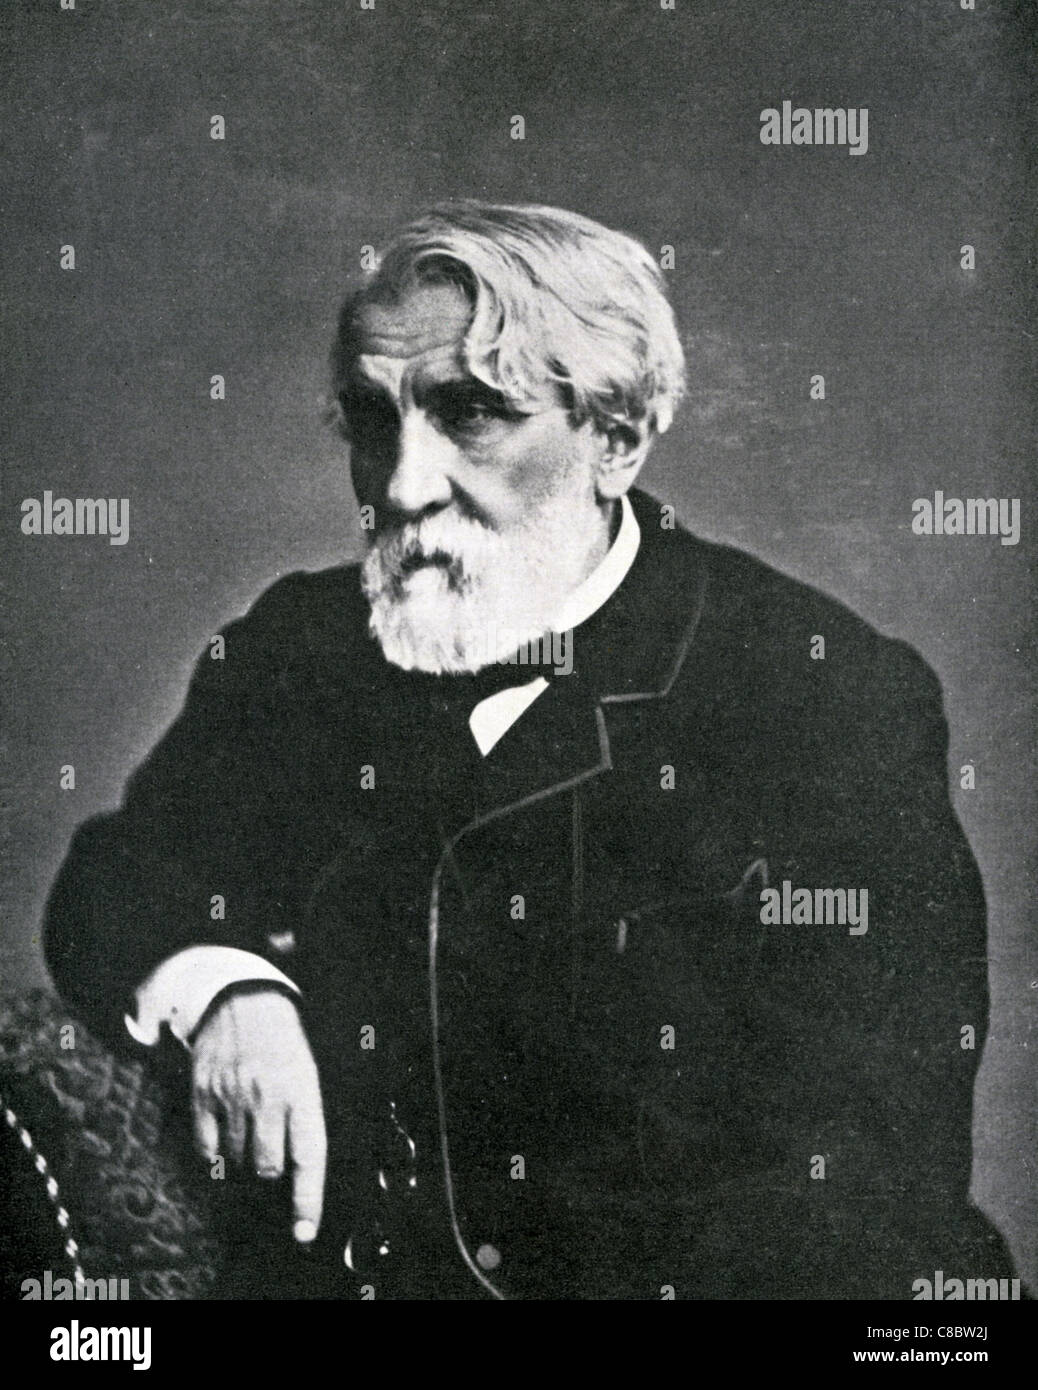 IVAN TURGENEV (1818-1883) Russian novelist - Stock Image